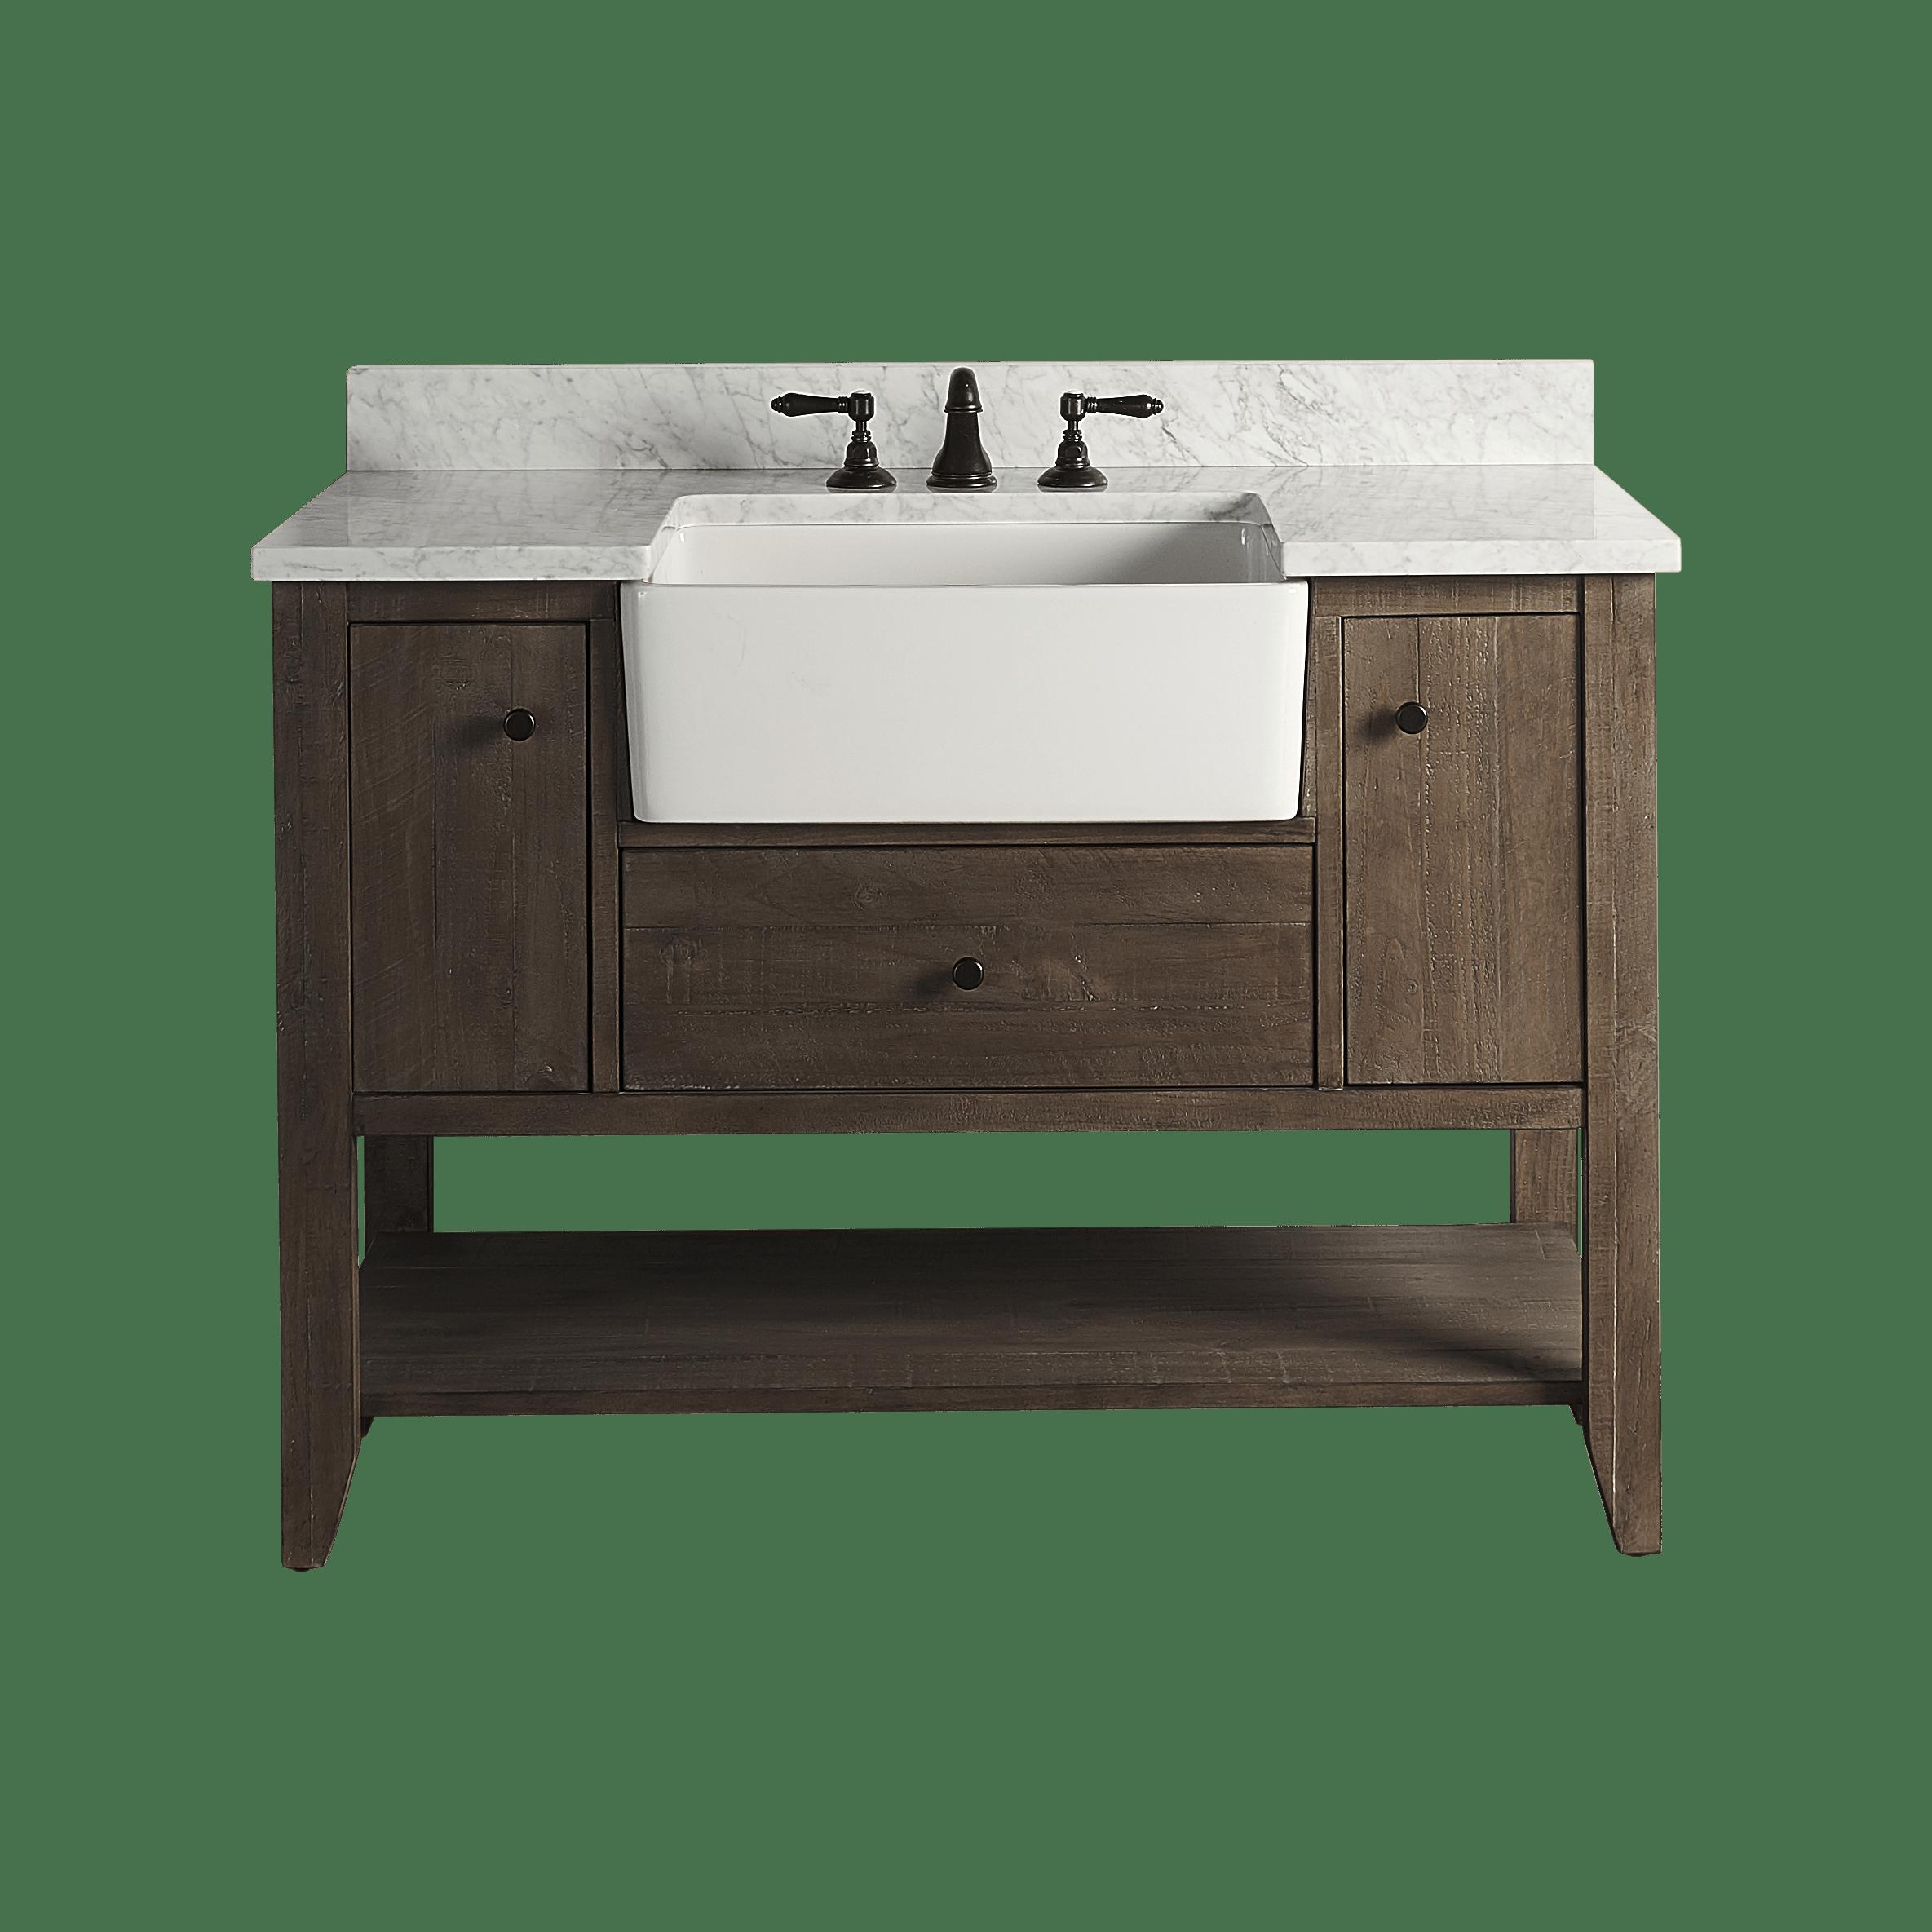 Fairmont Designs 1516 Fv48 River View 48 Bathroom Vanity Qualitybath Com